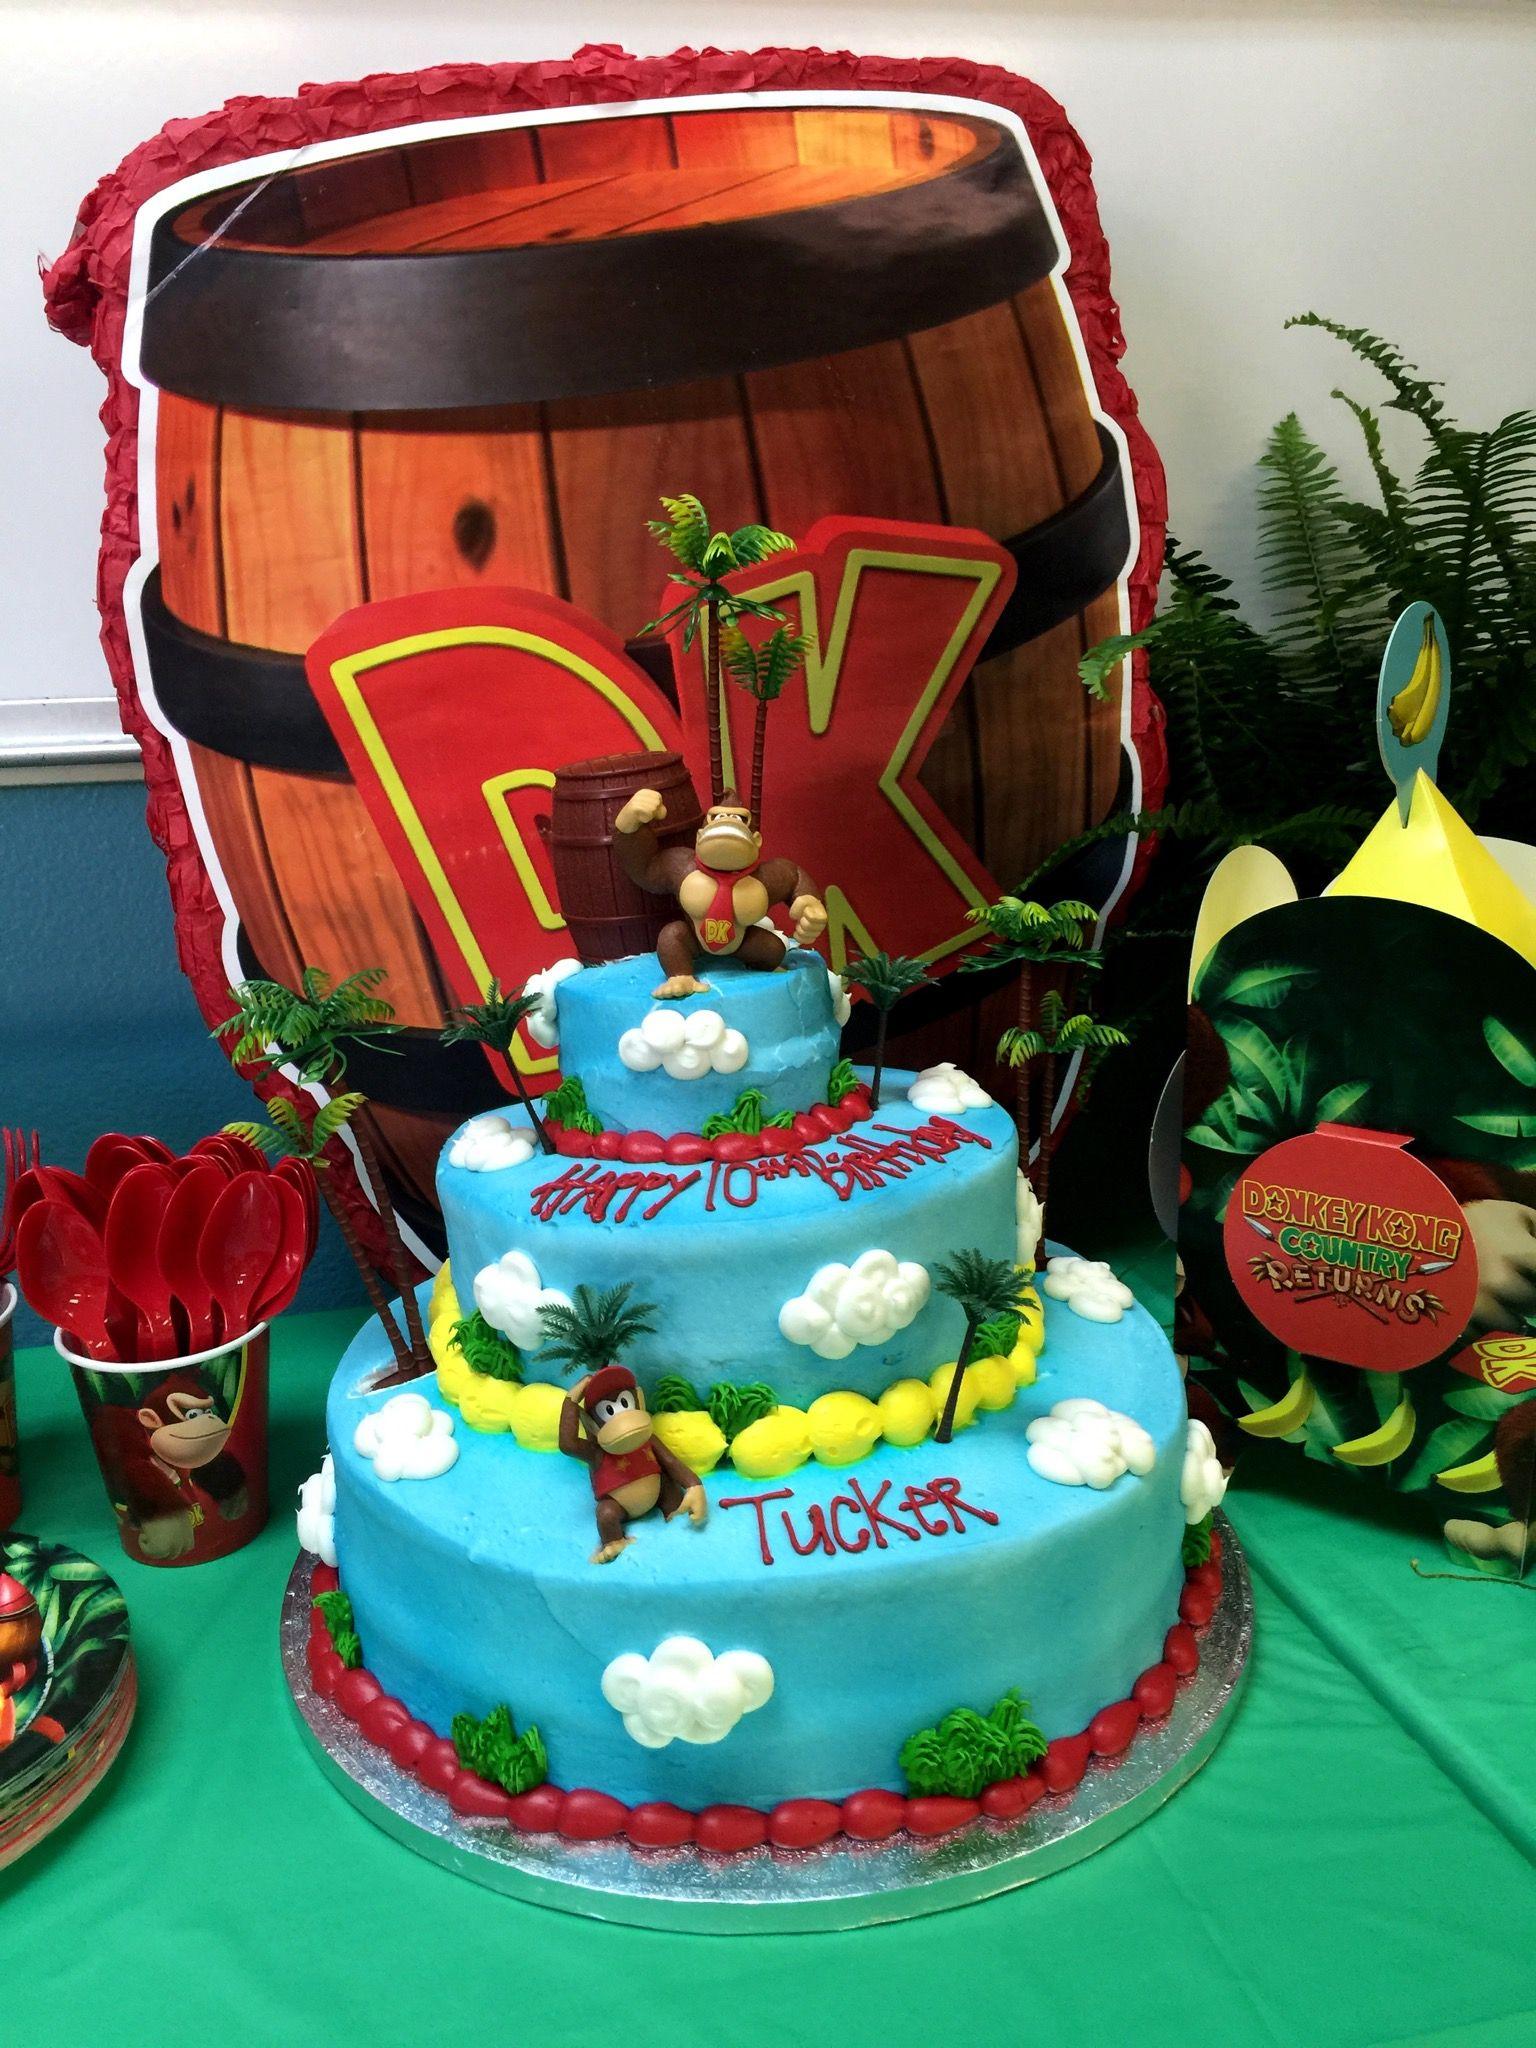 Donkey Kong Birthday Party Cake It S On Like Donkey Kong